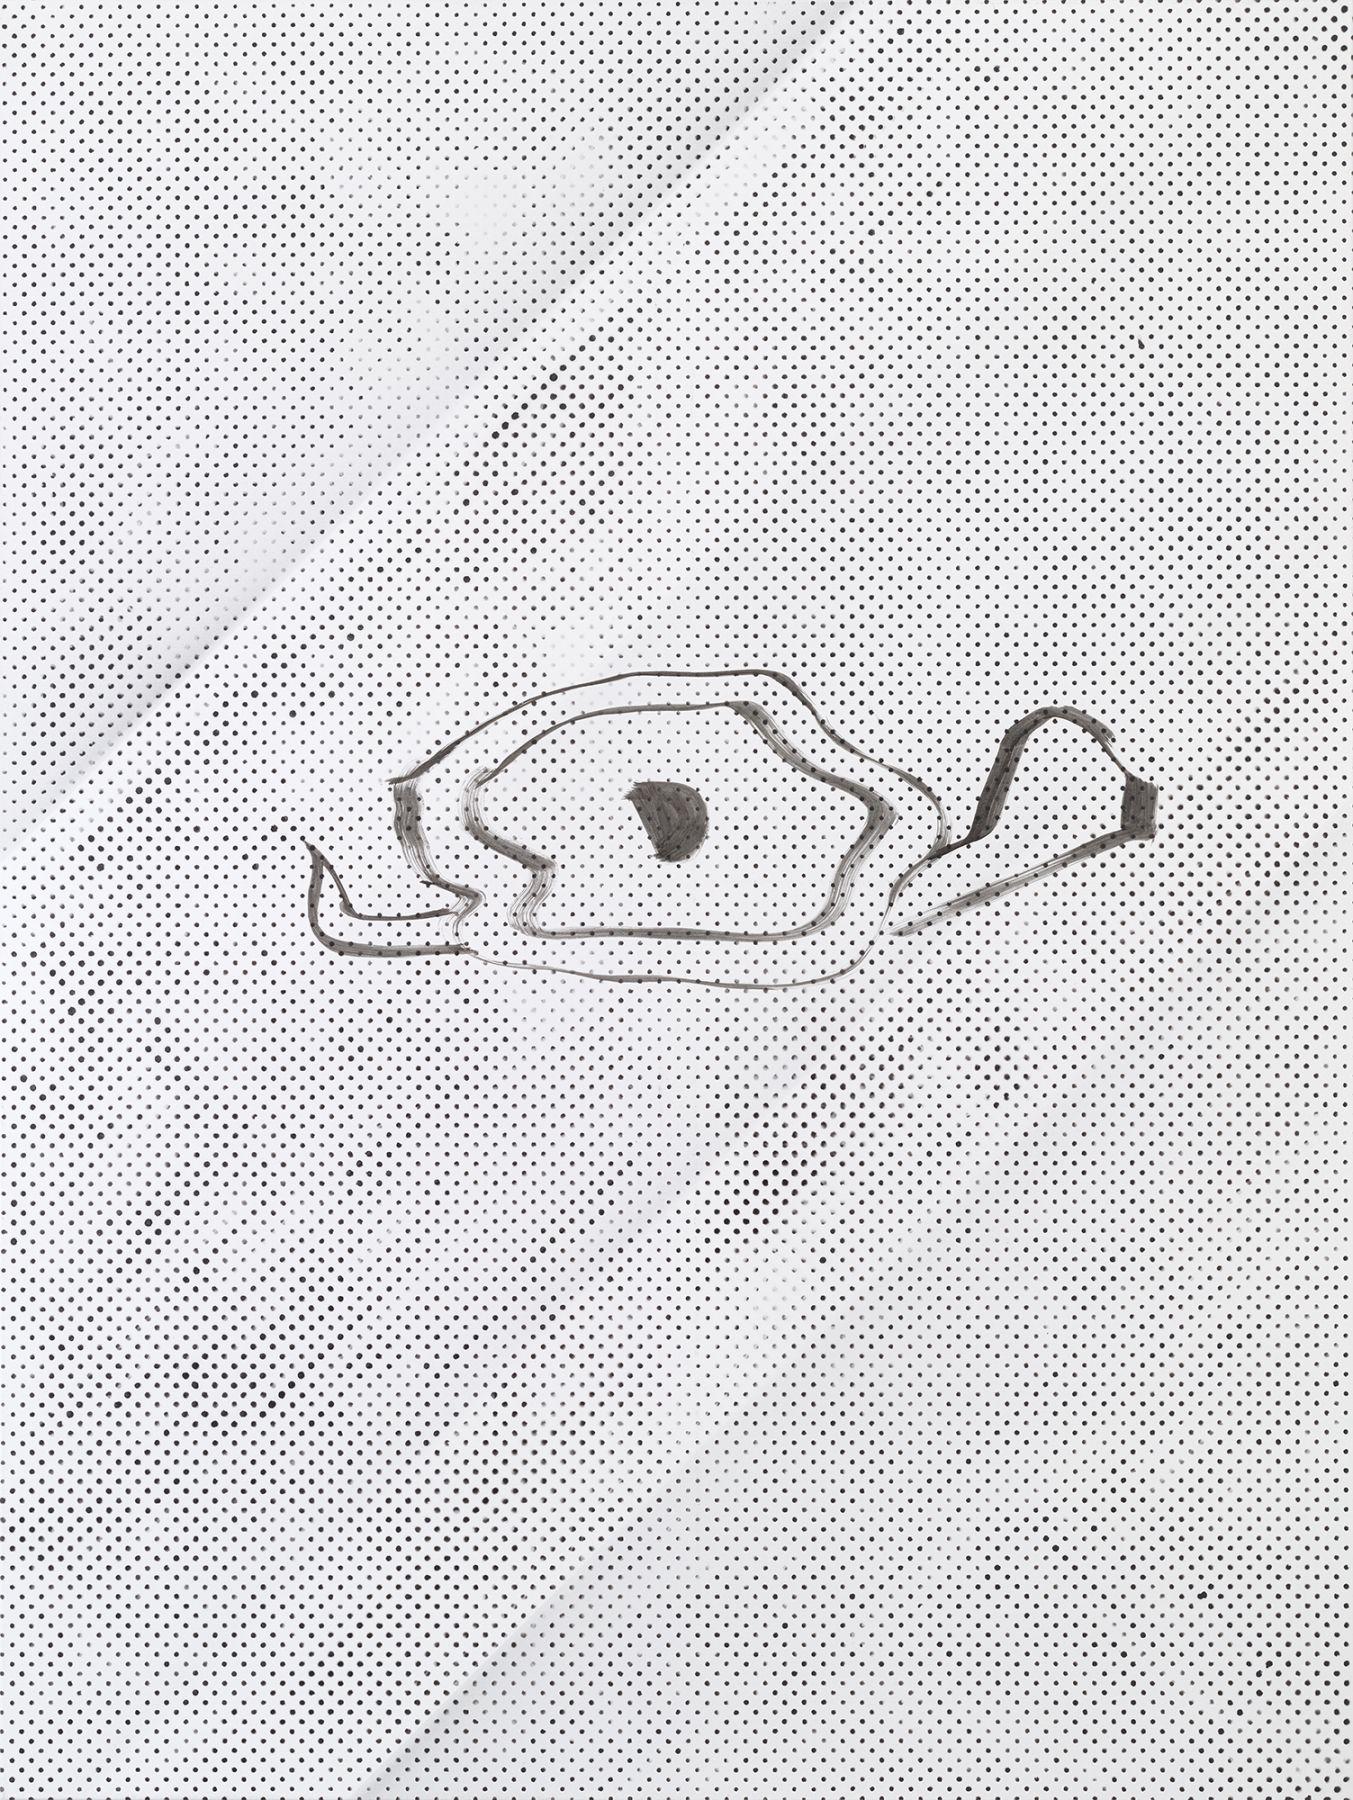 Michael Krebber MK.280, 2015 Lacquer on canvas 78 3/4 x 59 1/8 inches (200 x 150.2 cm)